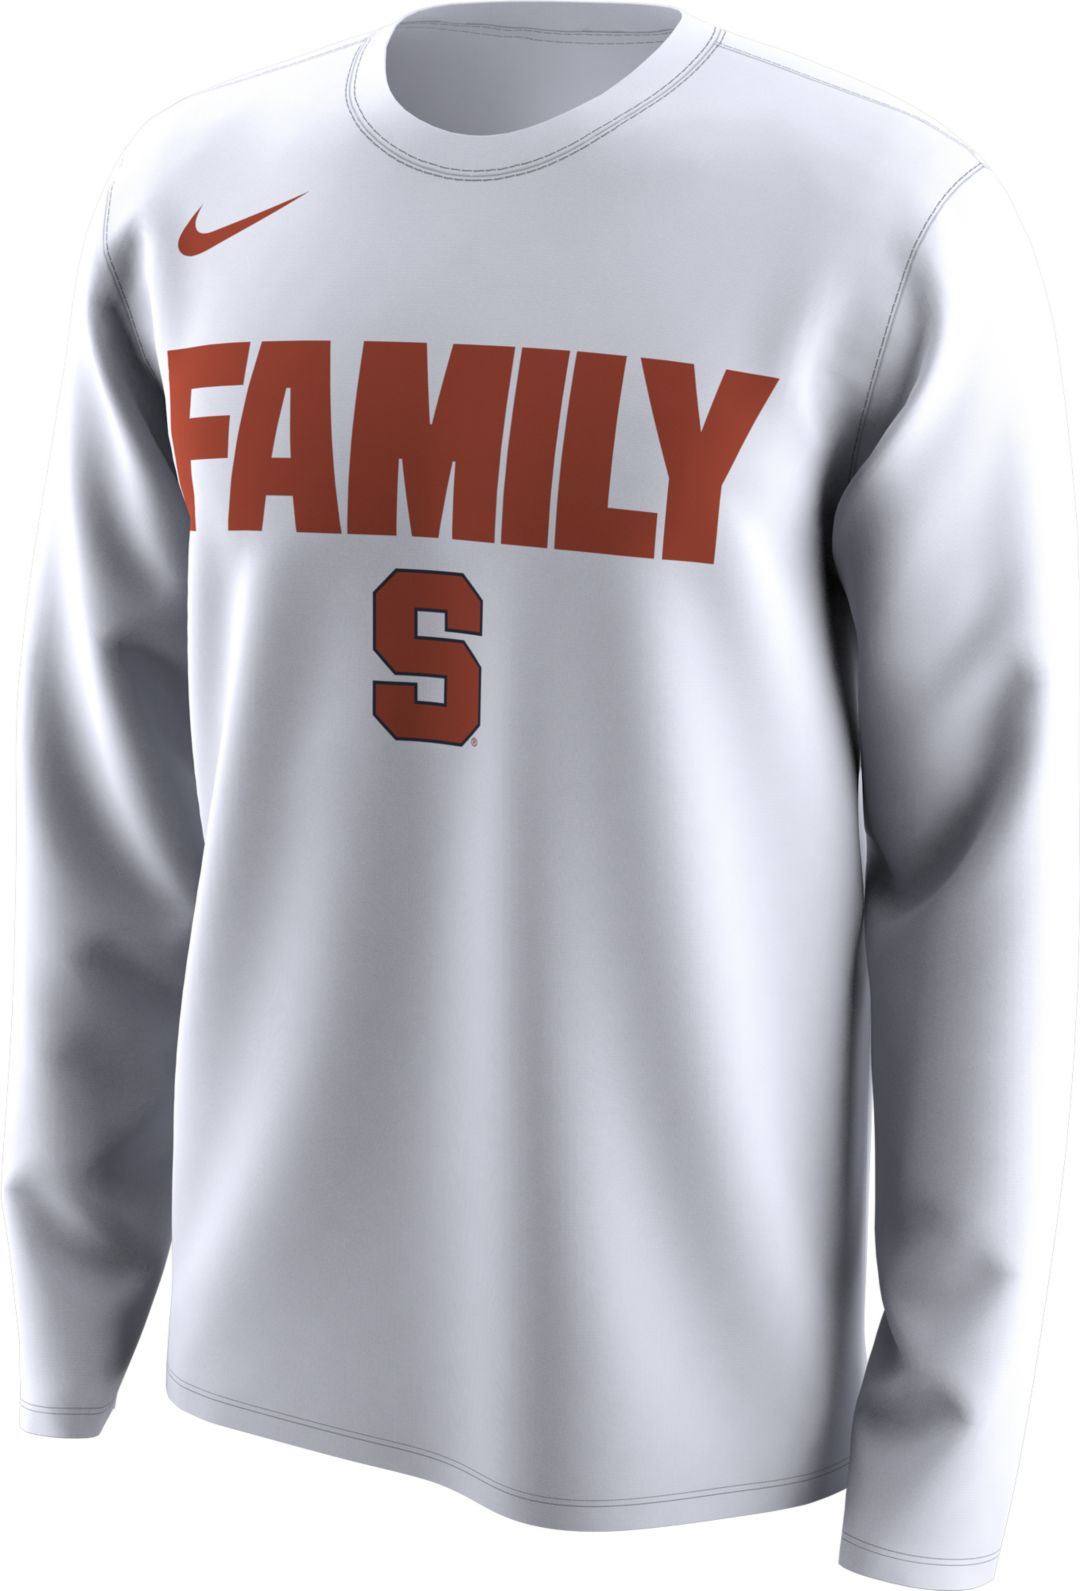 37cf55dc1 Nike Men's Syracuse Orange 'Family' Bench Long Sleeve White T-Shirt ...